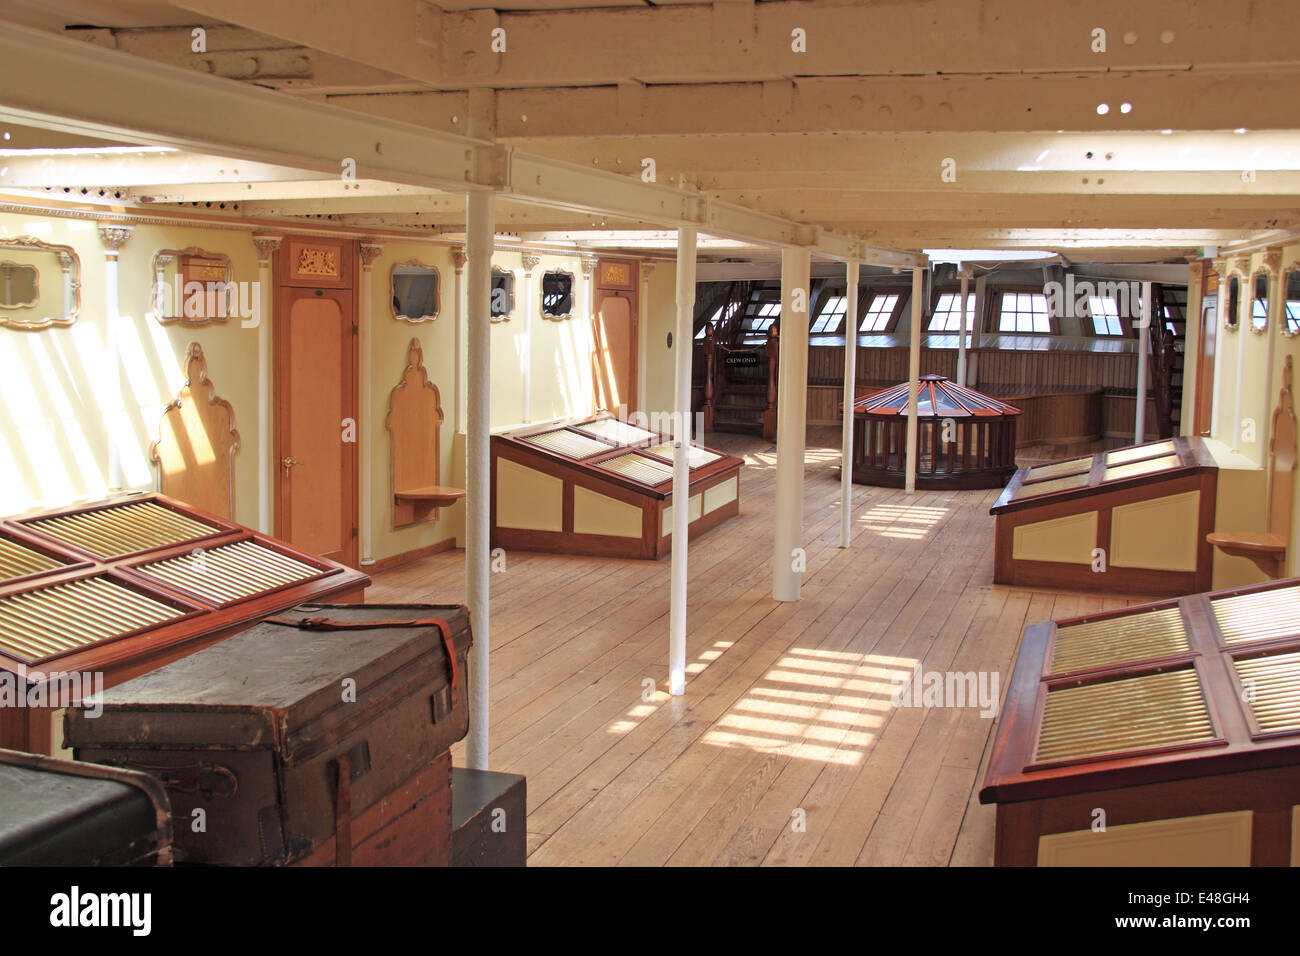 First Class lounge, SS Great Britain, Bristol Docks, England, Great Britain, United Kingdom, UK, Europe Stock Photo